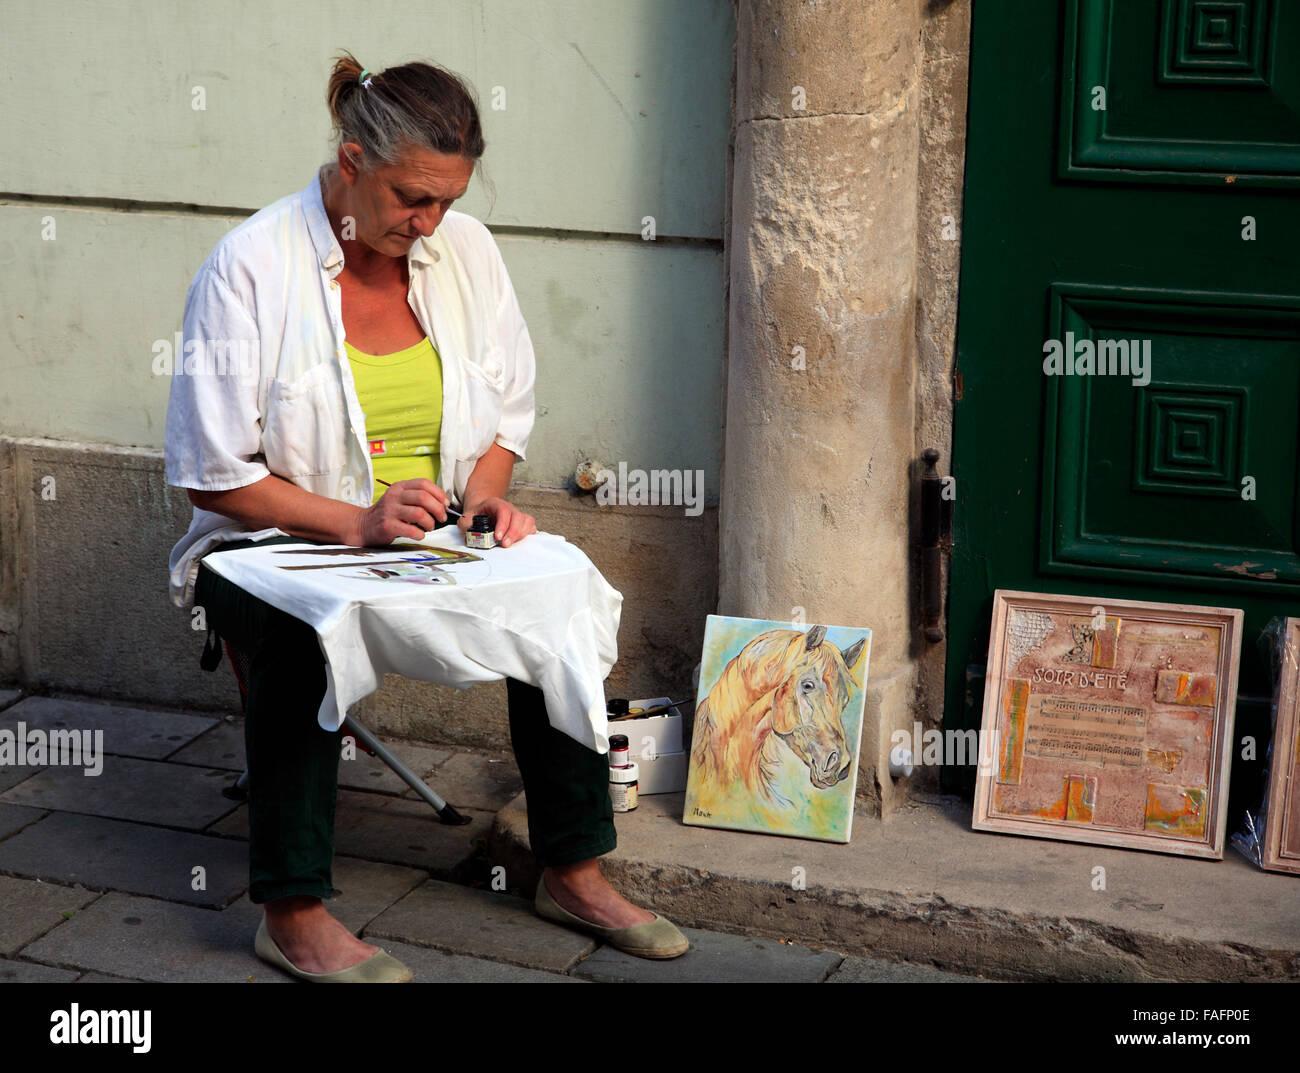 Painter, Bratislava, Slowakei, Europa - Stock Image